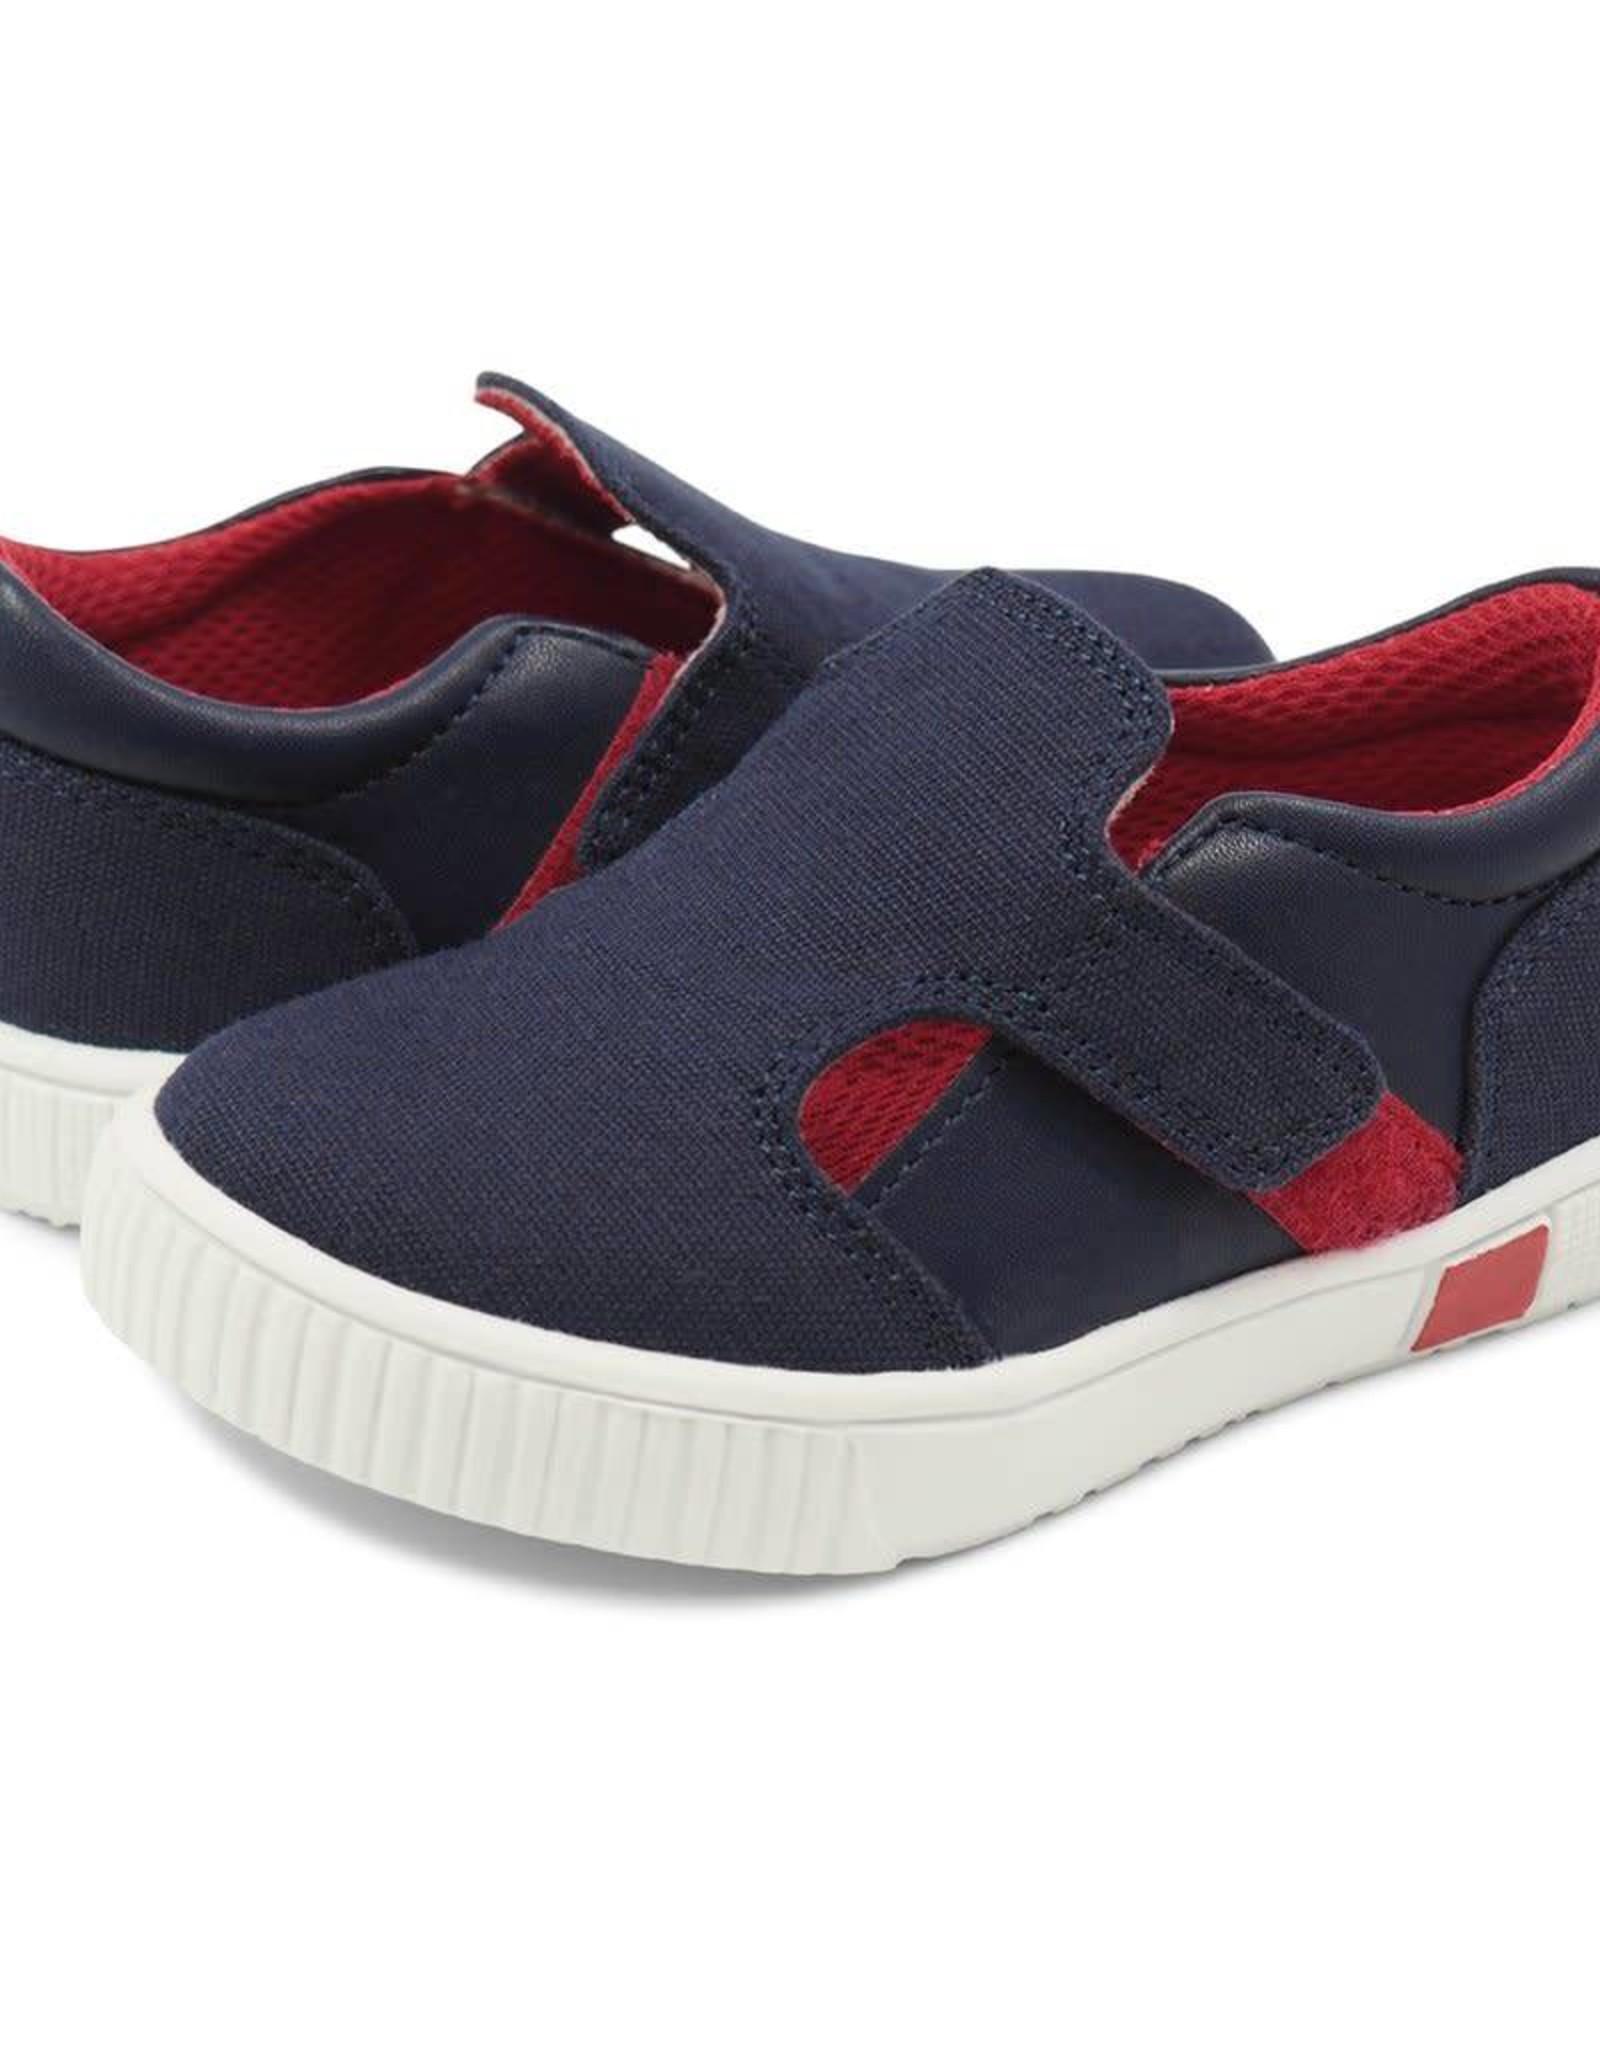 Livie and Luca Hop Sneaker in Navy